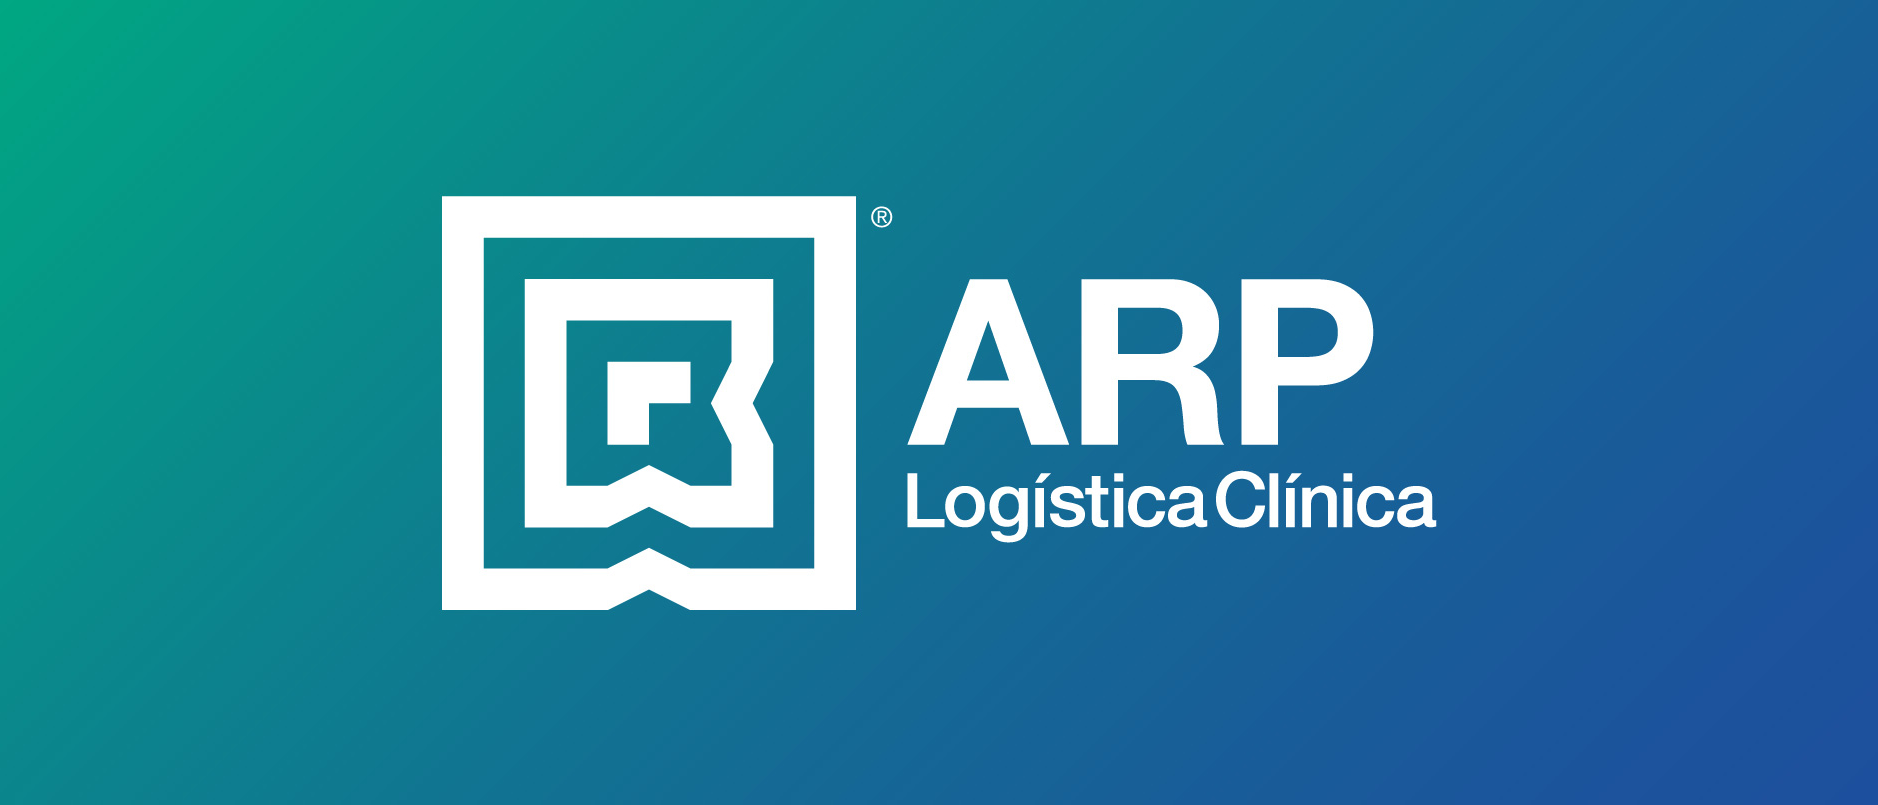 Diseño de Logotipo ARP Logística Clínica - tabarestabares